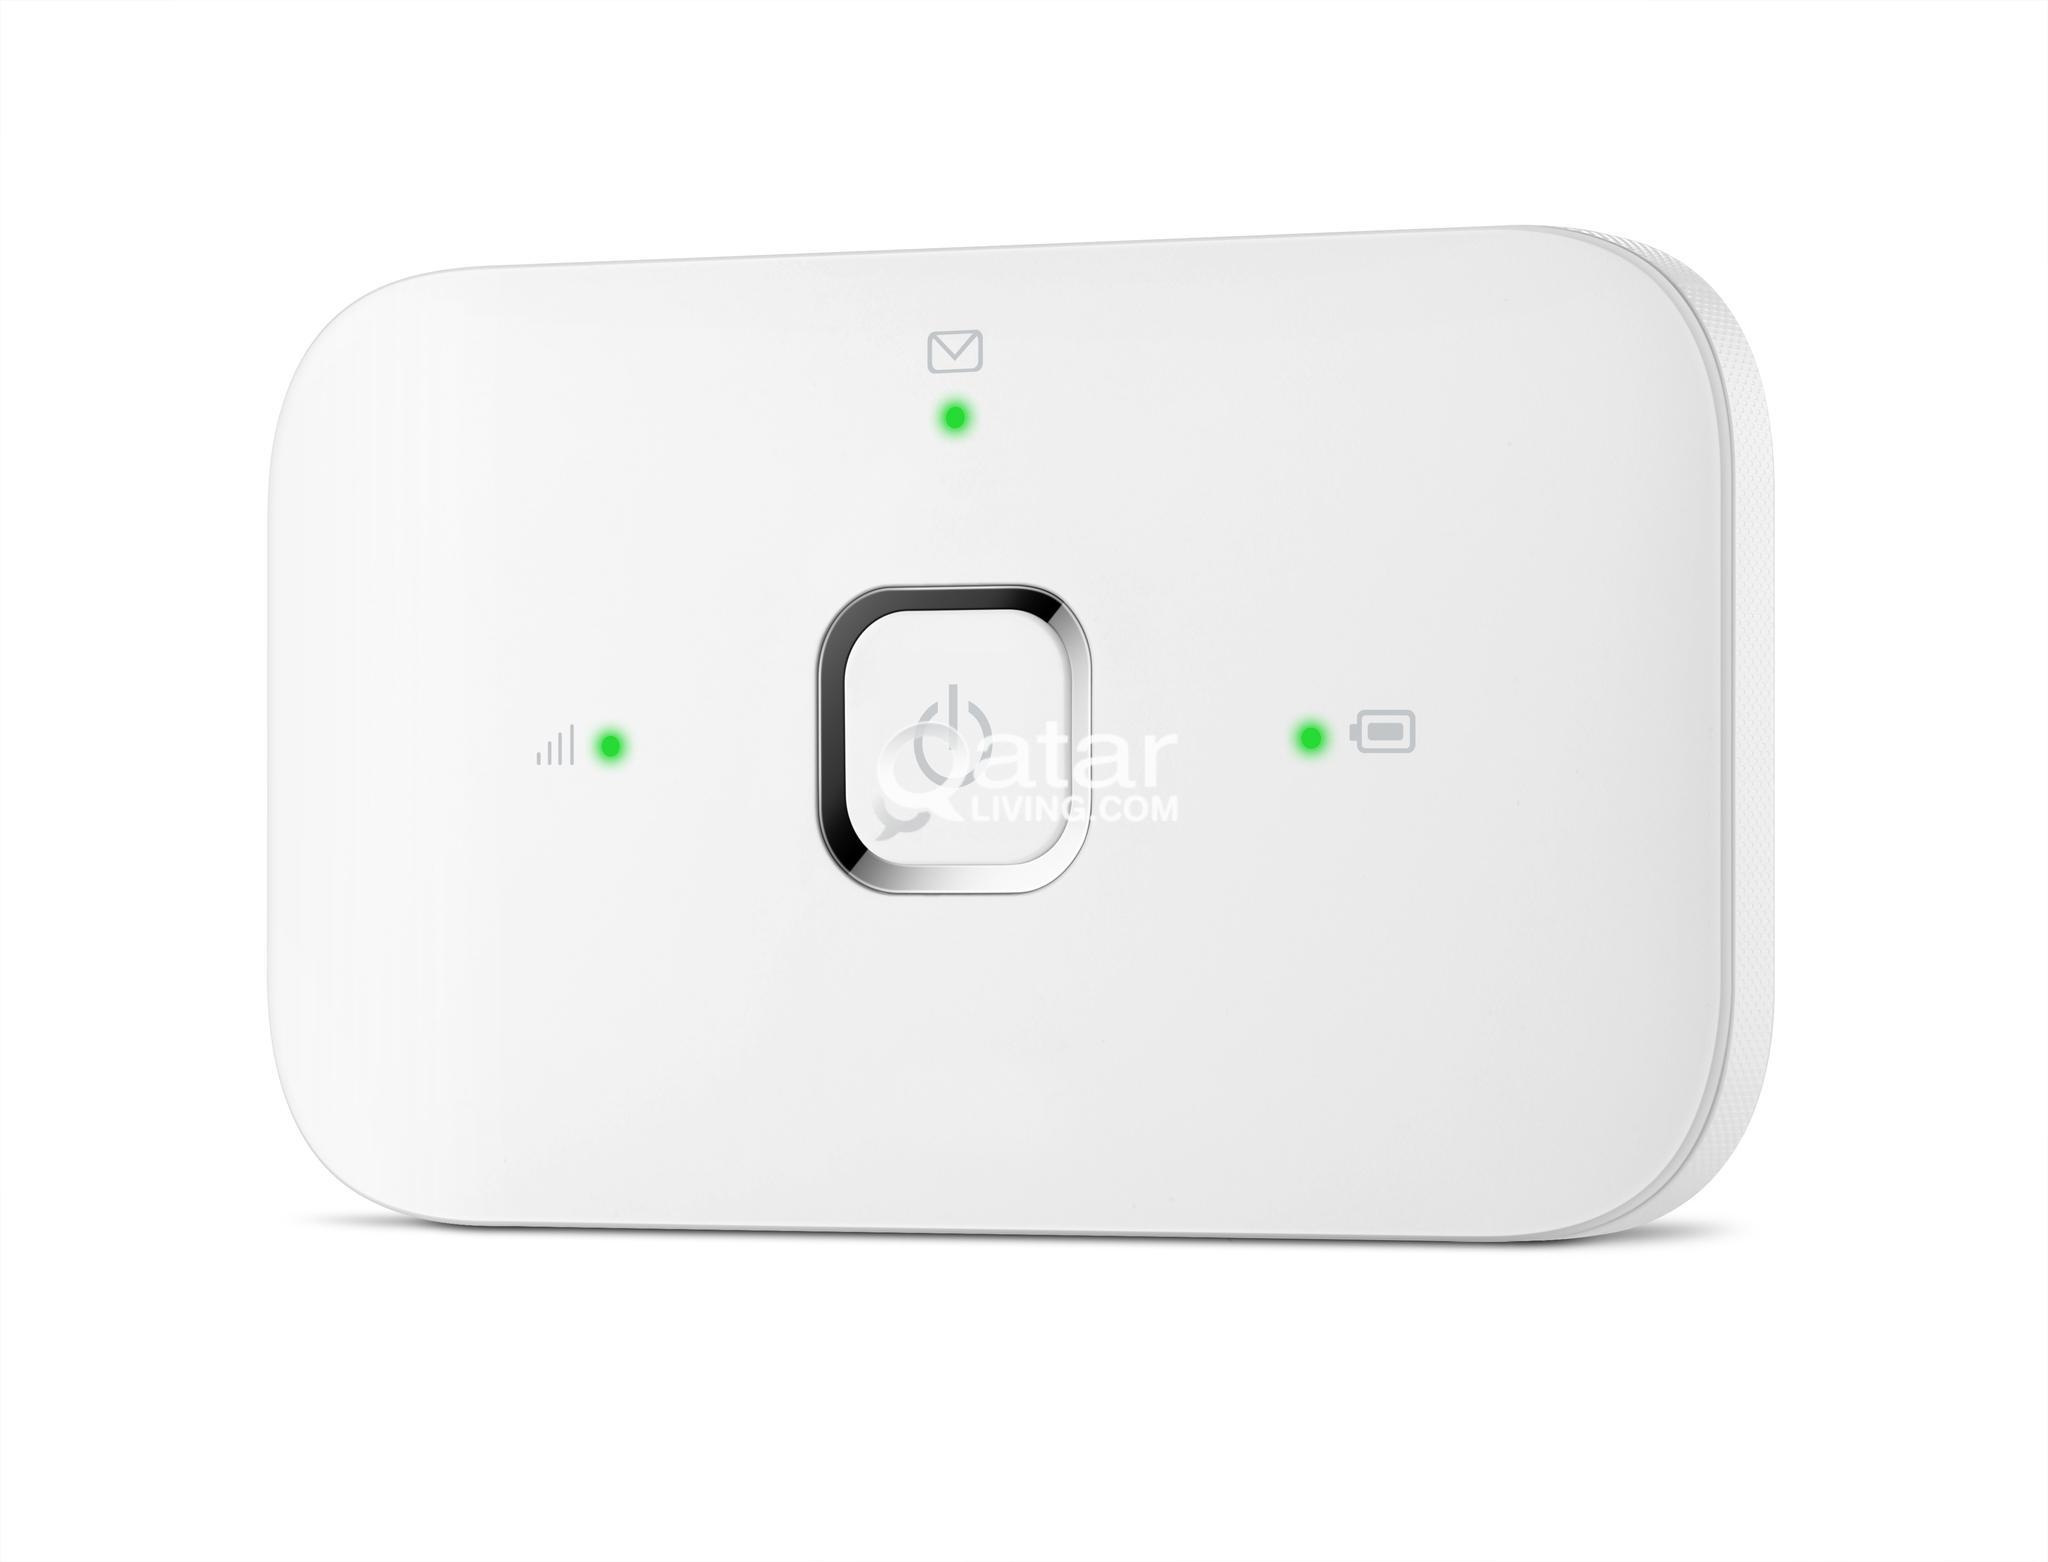 Unlimited Internet Free Pocket WiFi Device.